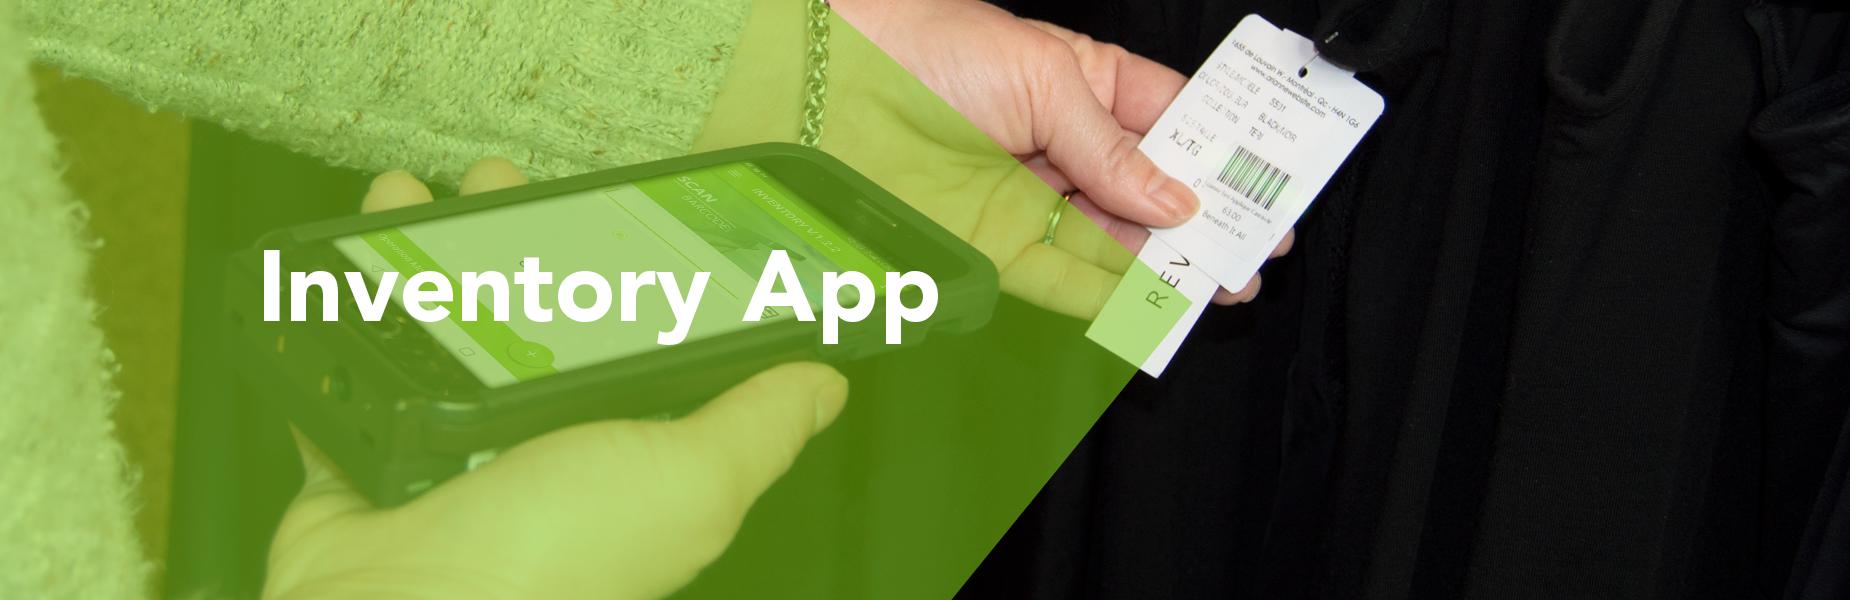 KOAMTACON Inventory App by KOAMTAC